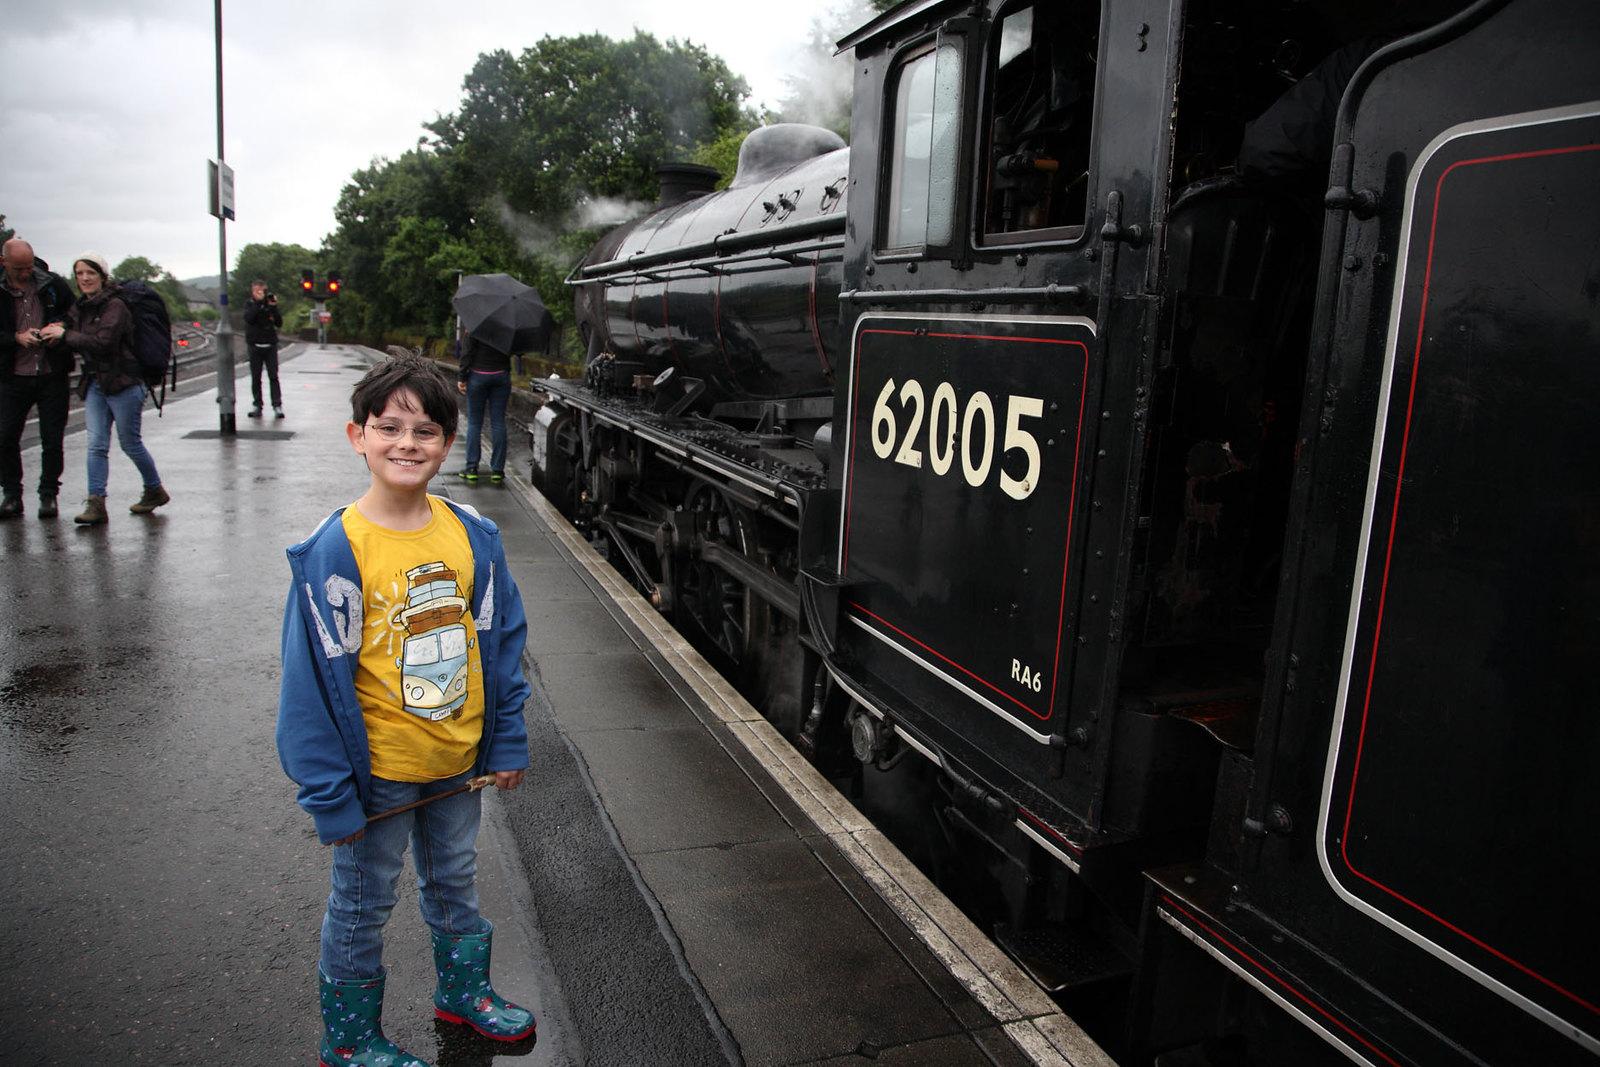 Jacobite steamtrain locomotive